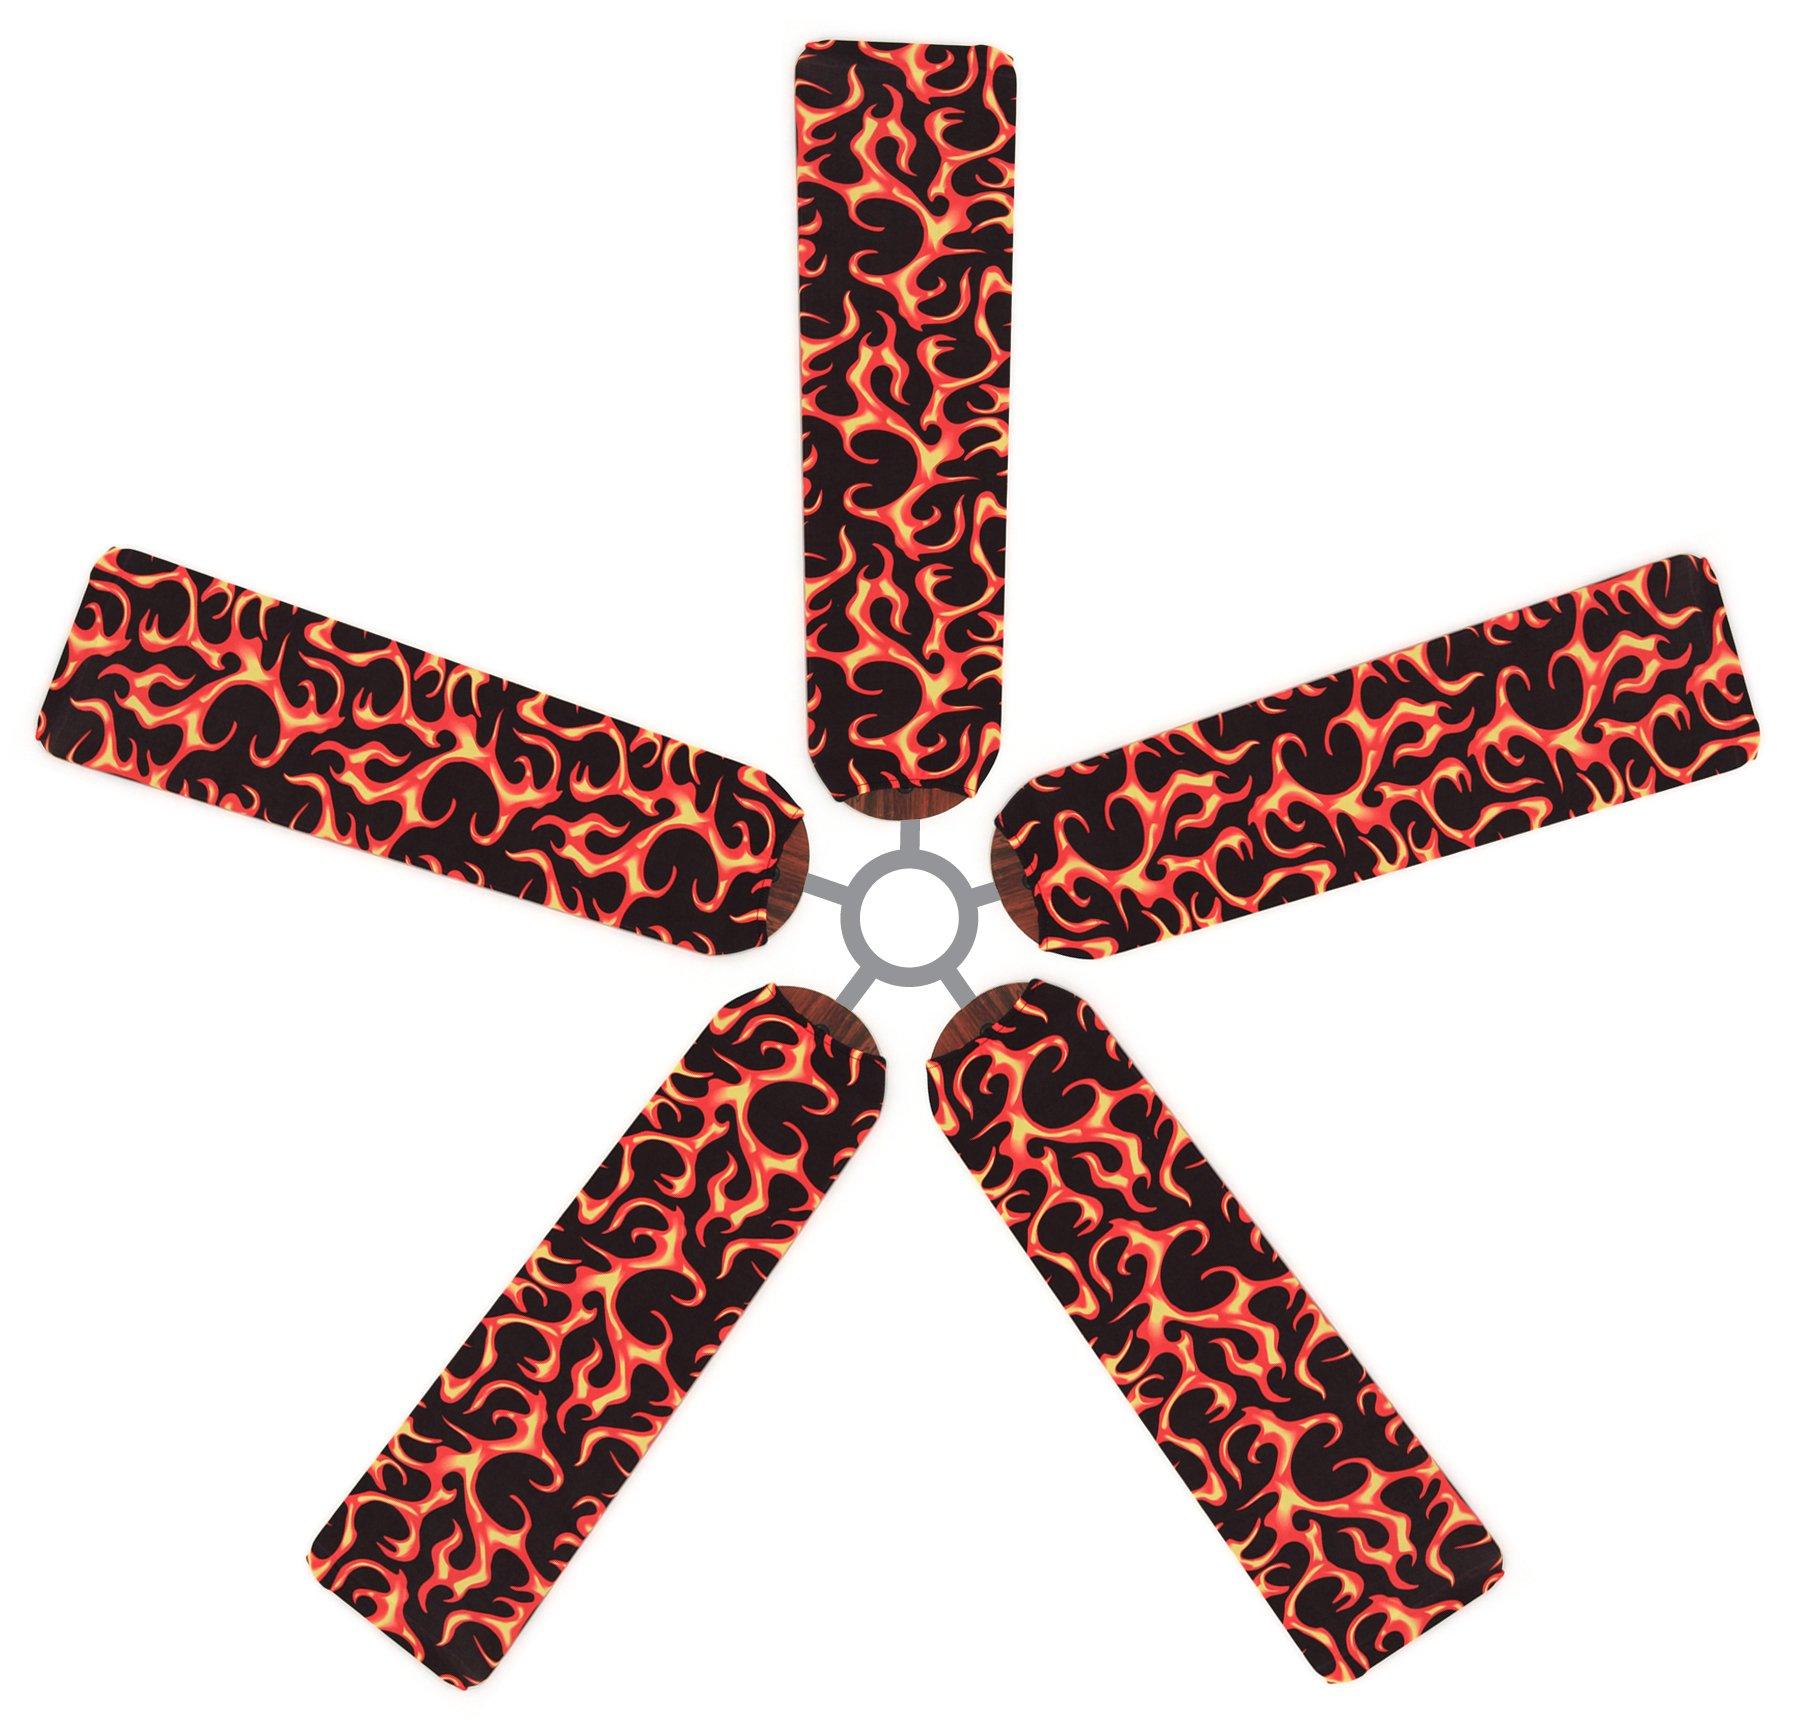 Fan Blade Designs Flaming Ceiling Fan Blade Covers